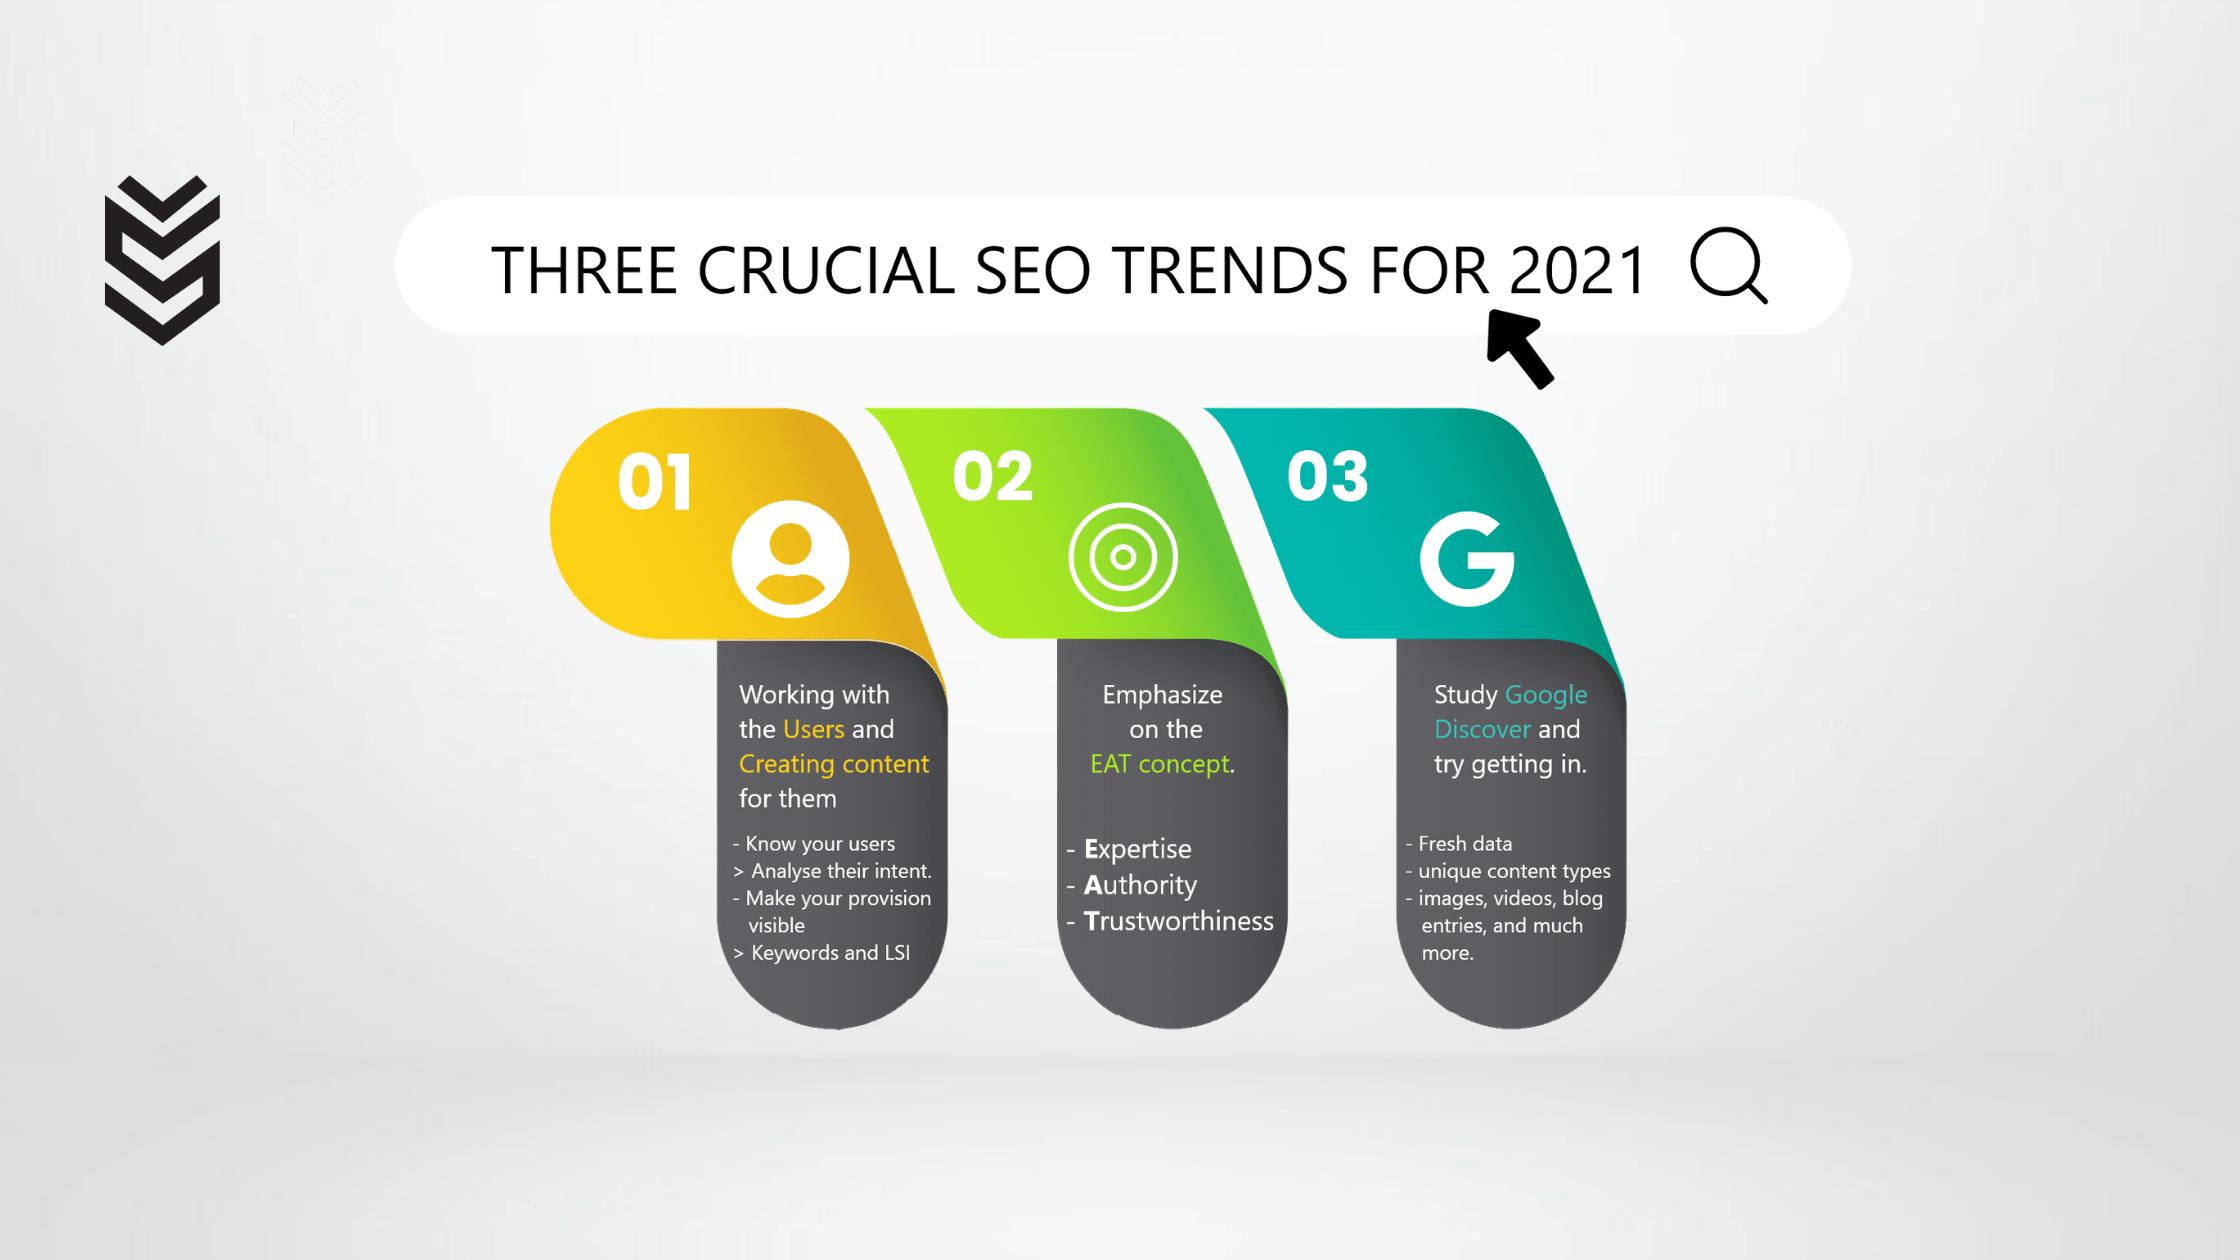 SEO trends in 2021: Best 3 Tactics to Increase Website Traffic